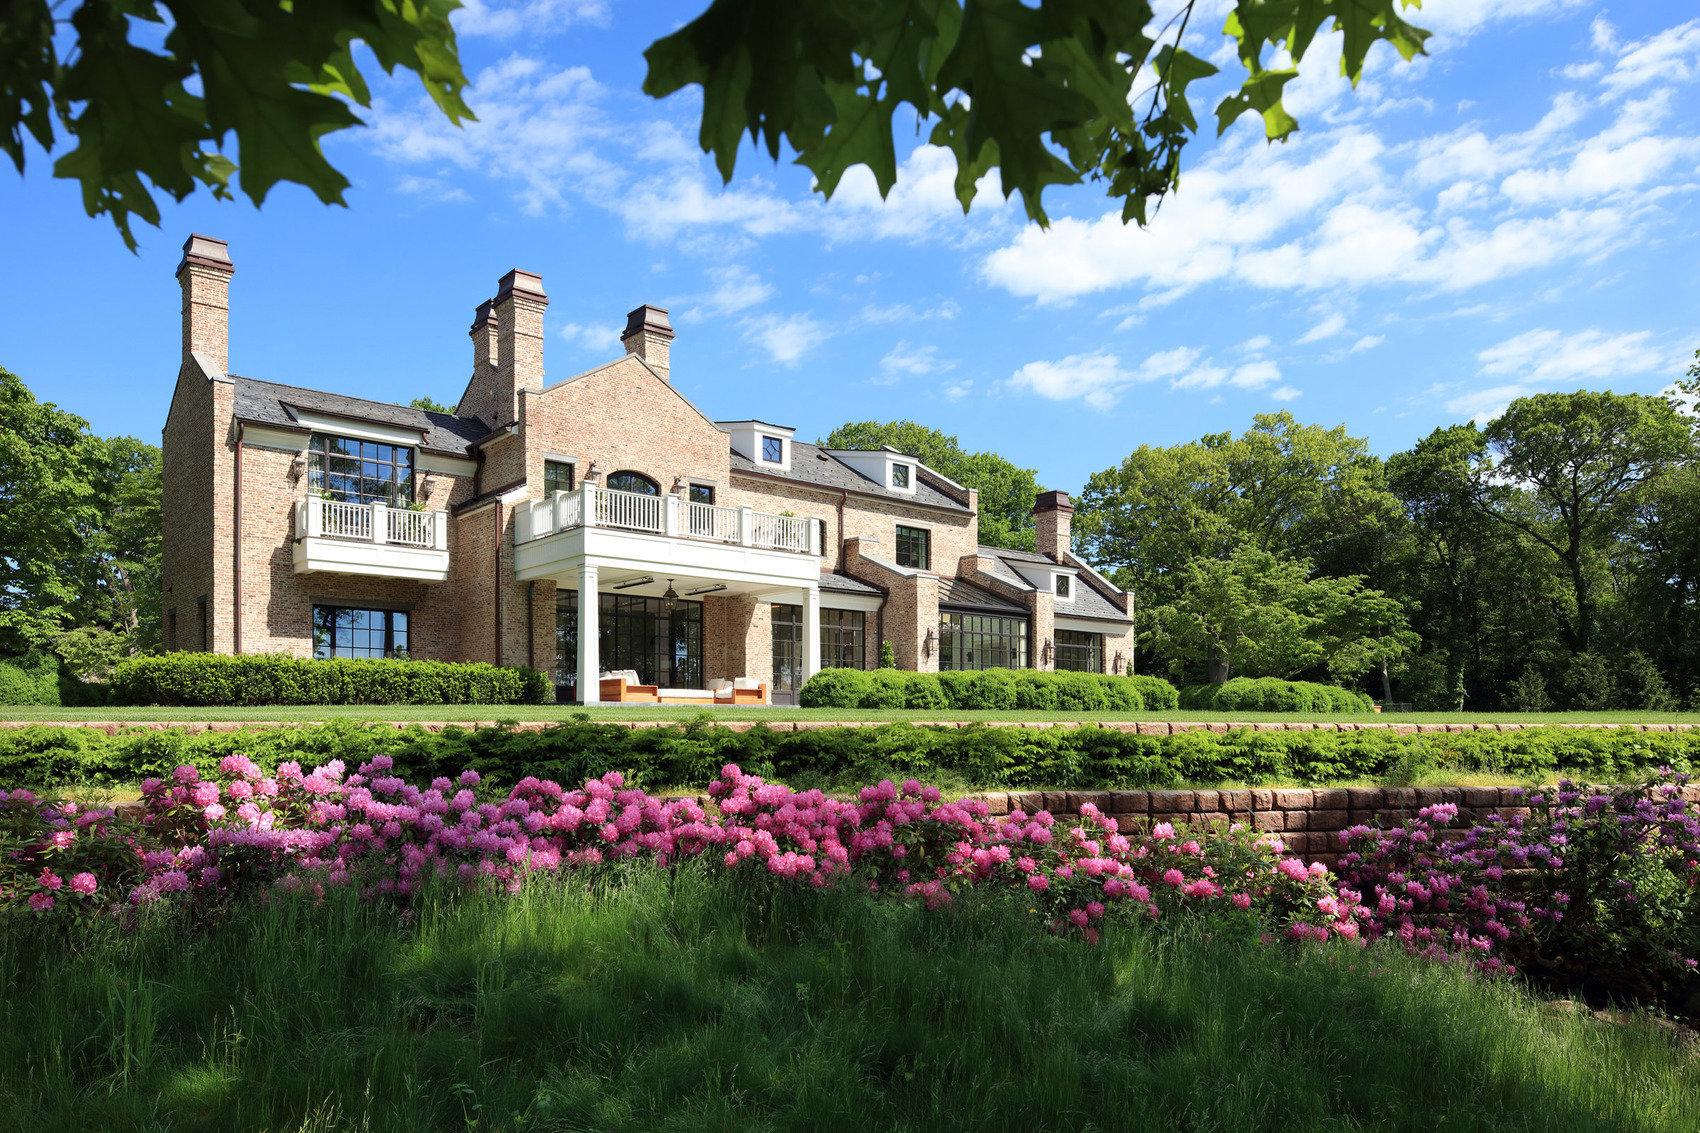 Tom Brady's Brookline, Massachusetts mansion is for sale